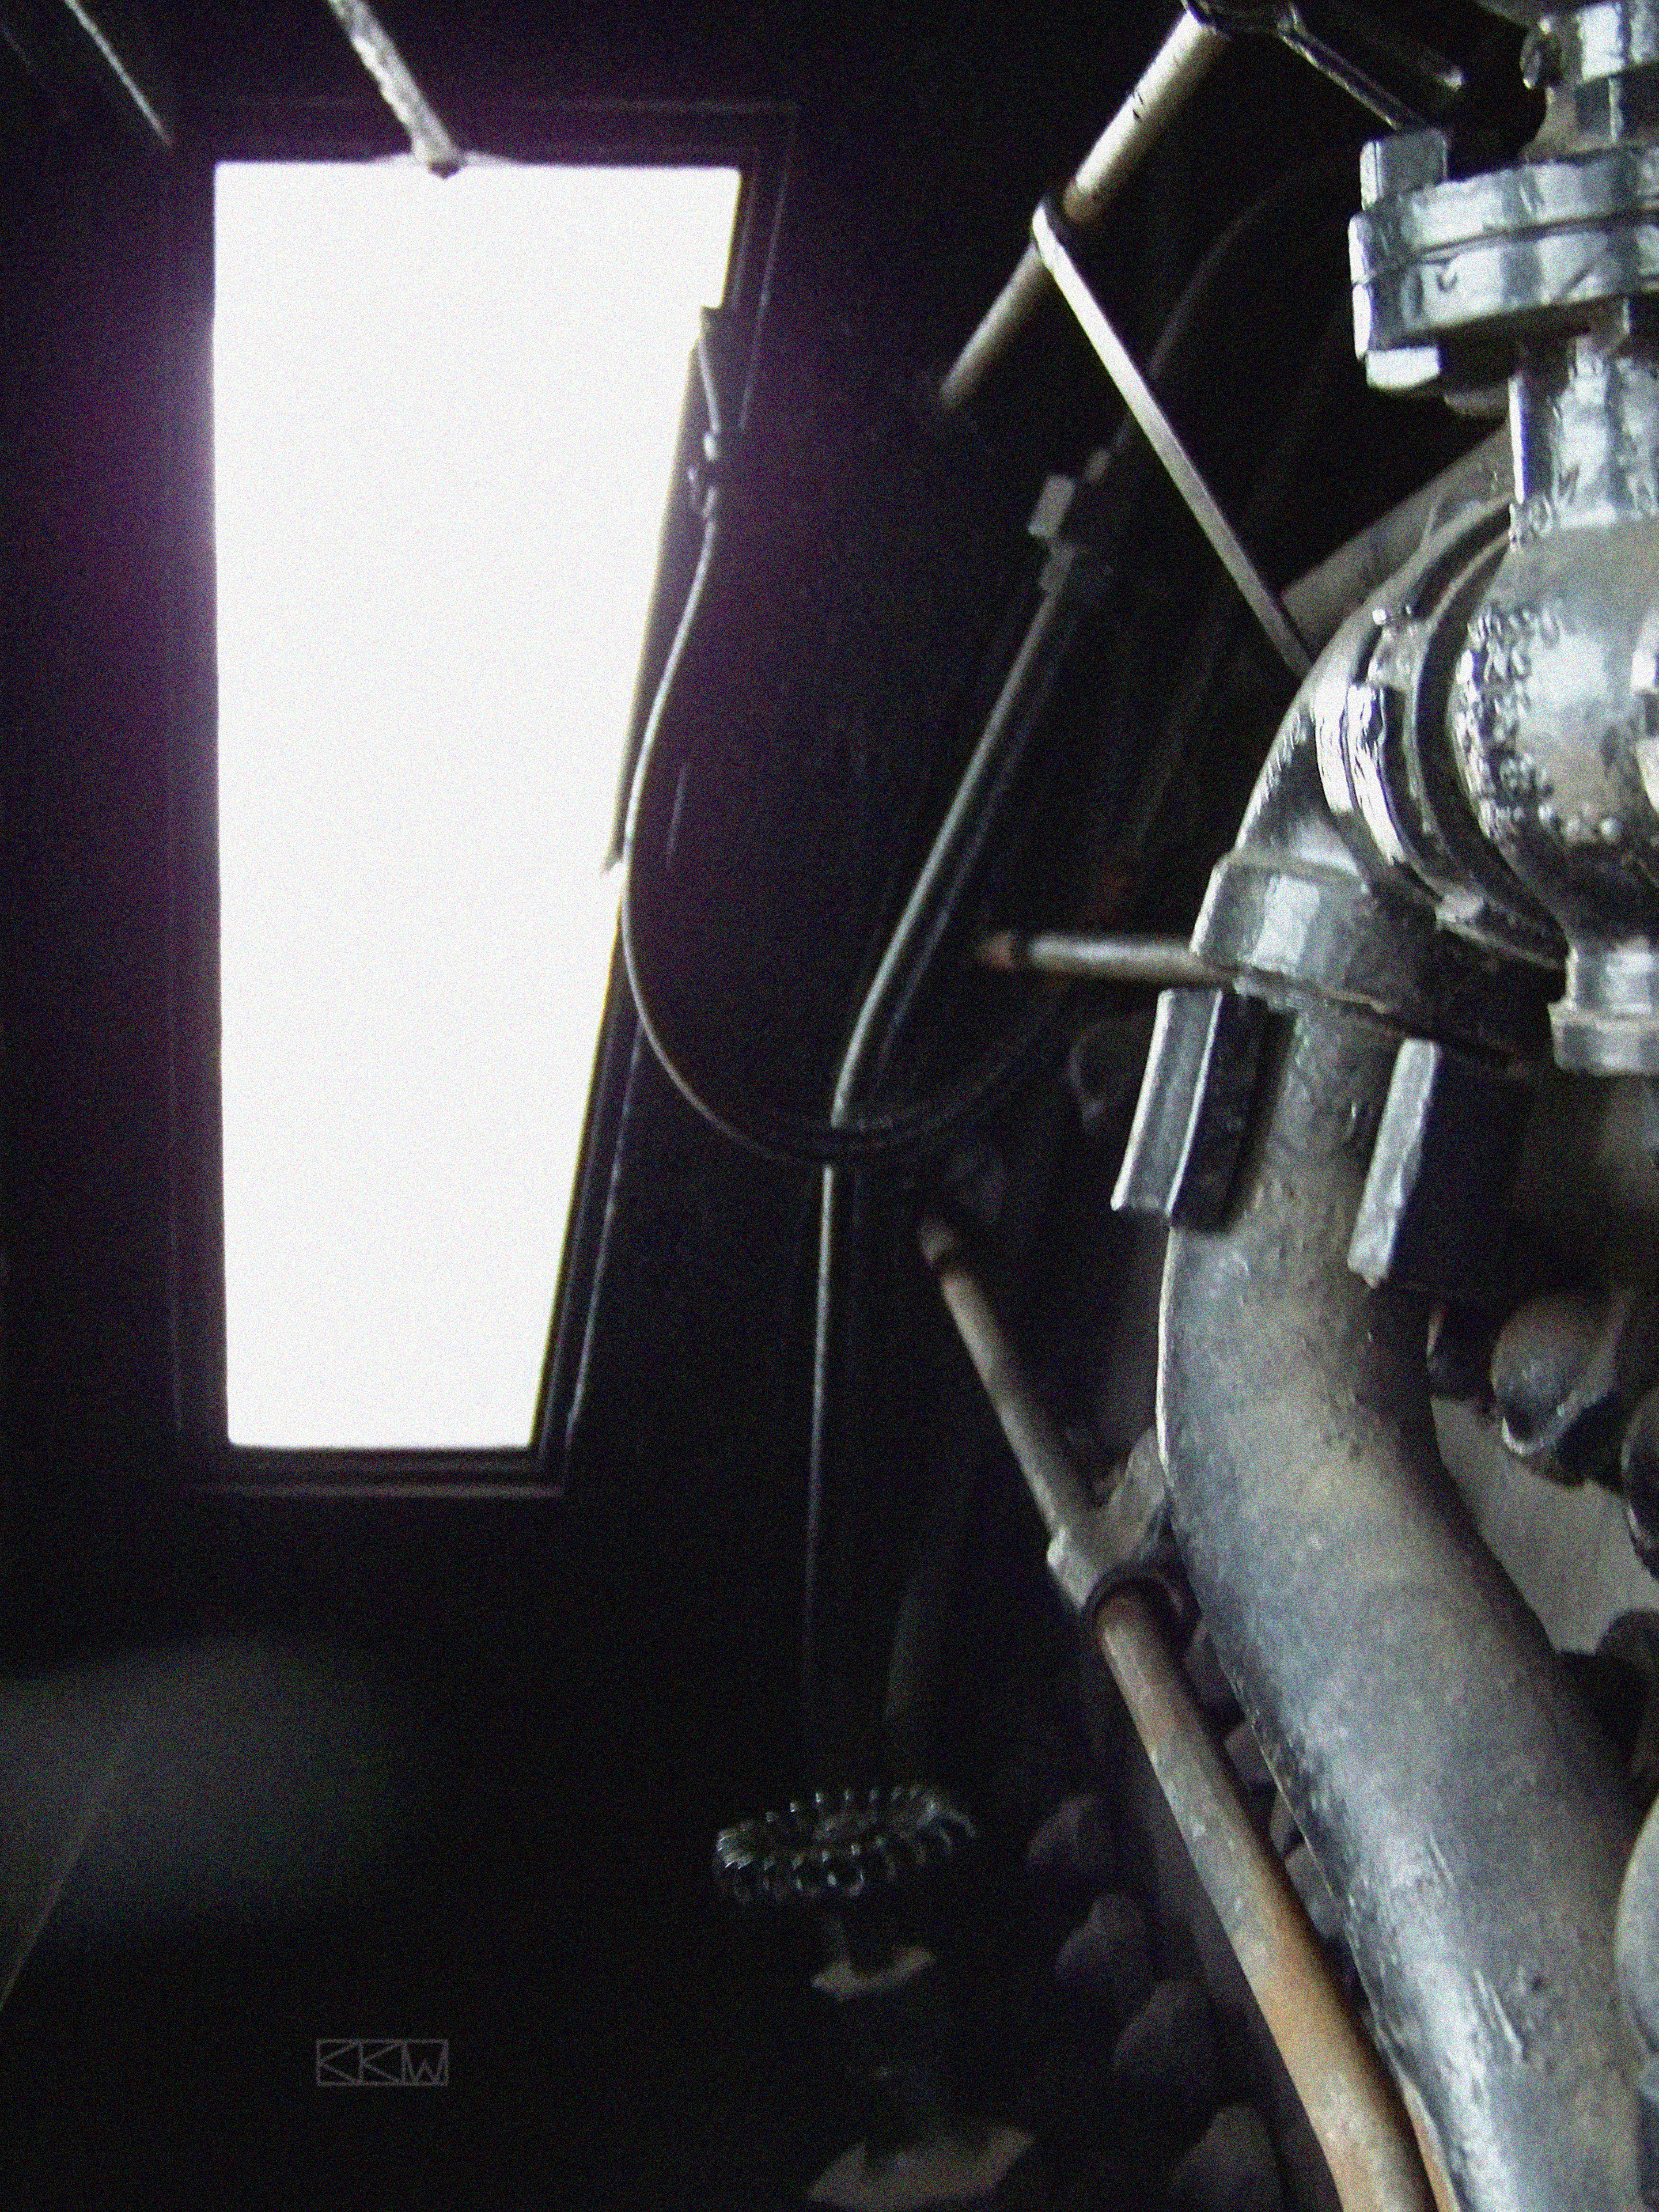 Restored Locomotive No. 2713 by Crigger